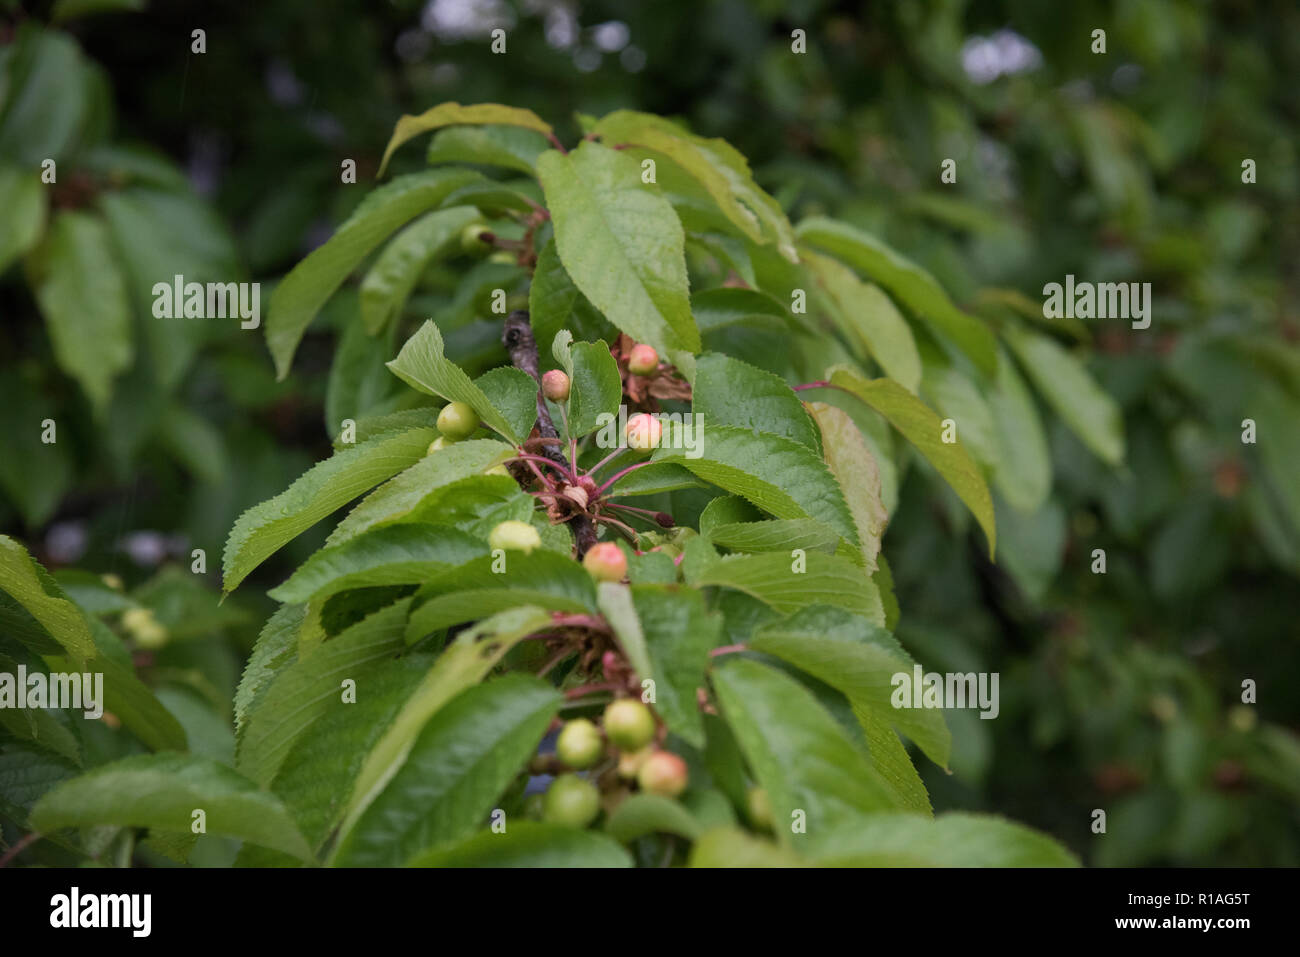 128/5000 Unripe cherries - Stock Image